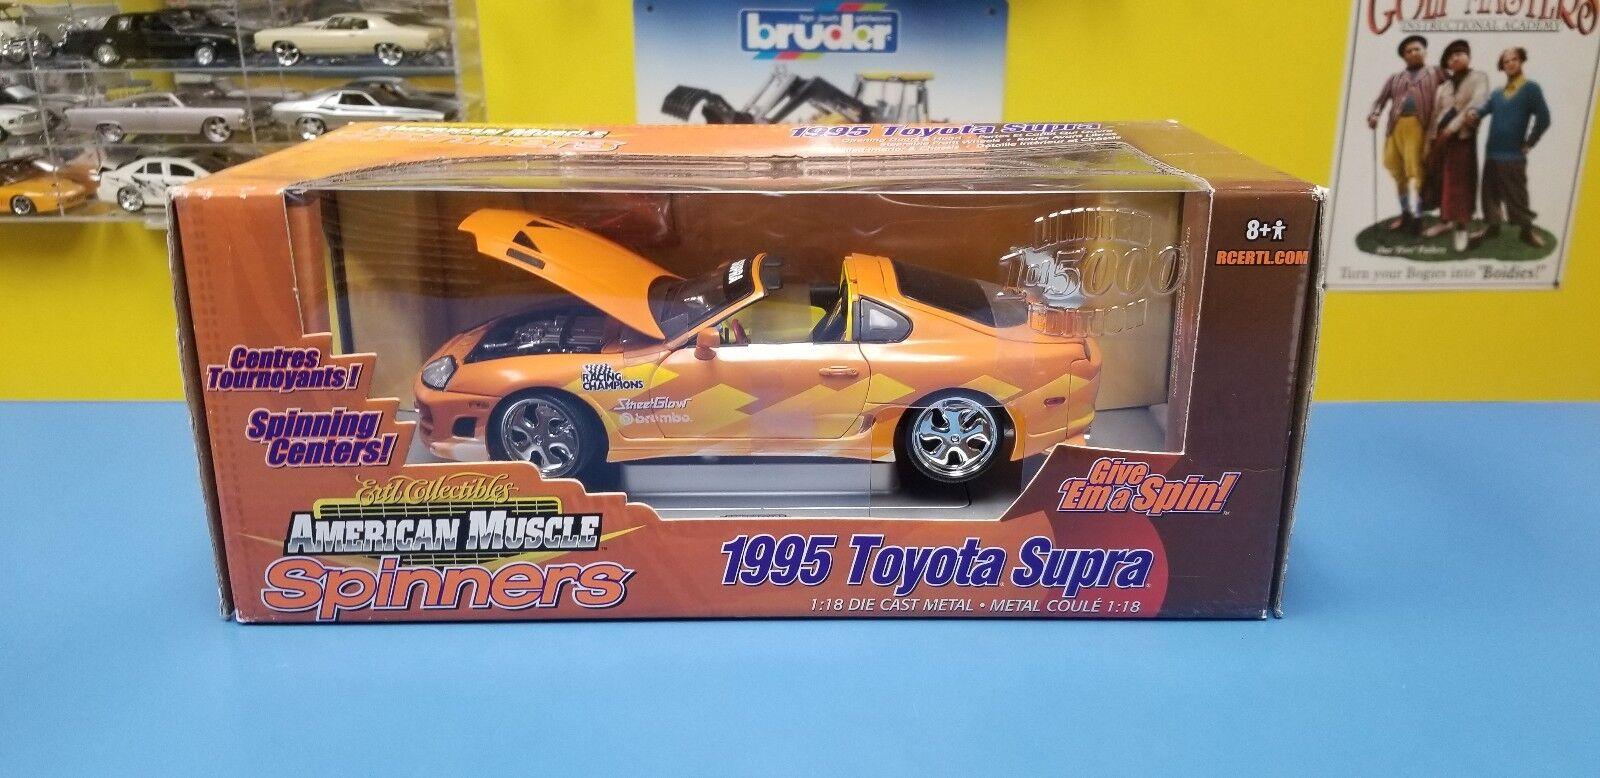 ERTL American Muscle Spinners 1995 Toyota  Supra 1 de 5000 NEUF  nouveau sadie